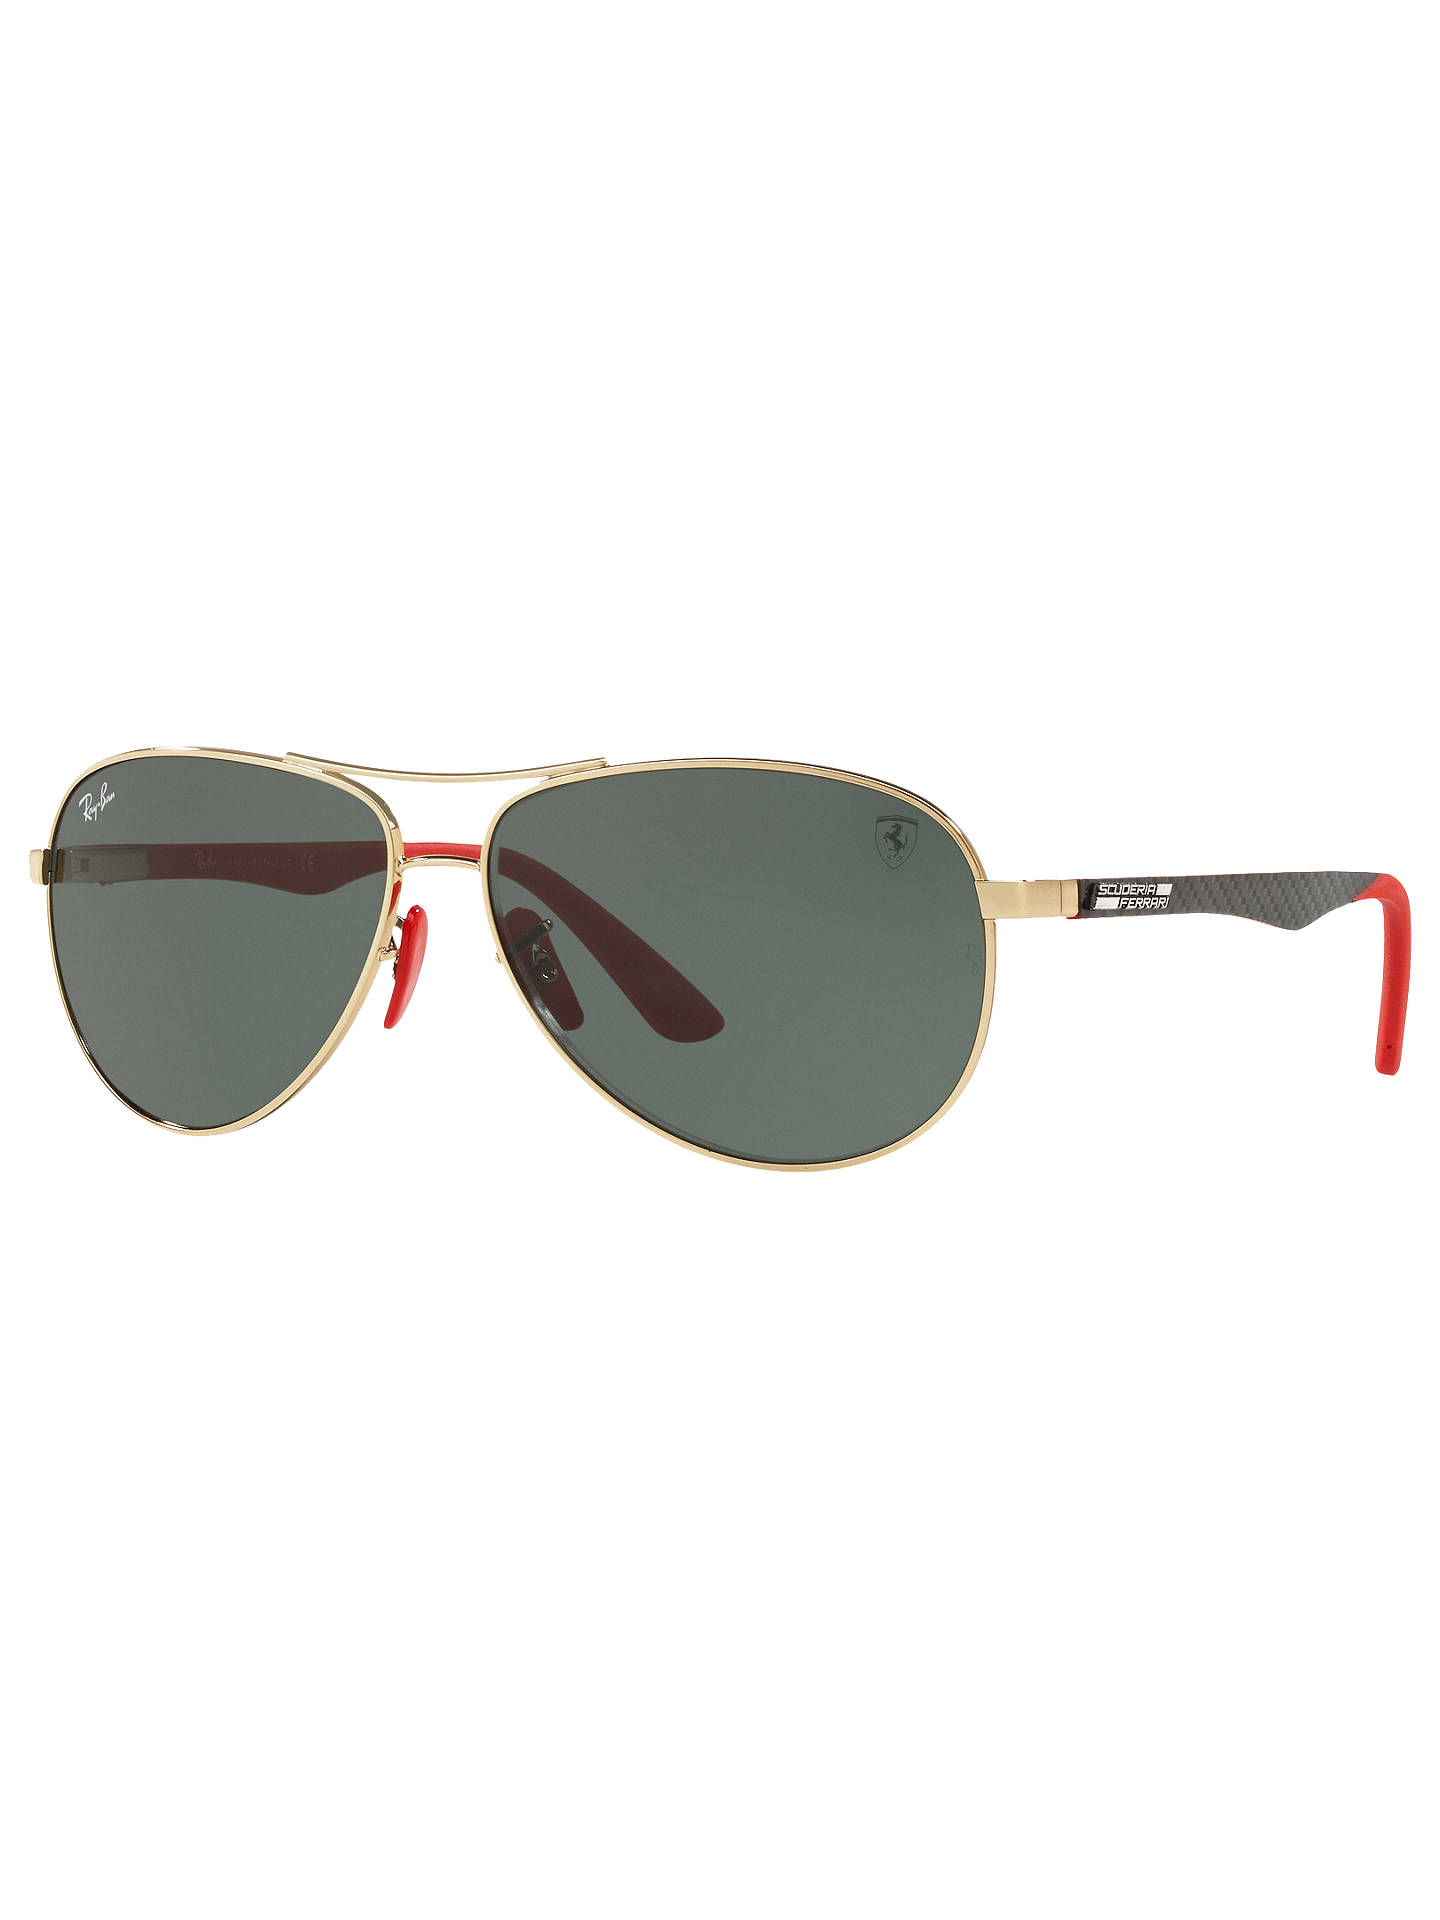 5ee5dabb4dc Ray-Ban RB8313M Scuderia Ferrari Aviator Sunglasses at John Lewis ...